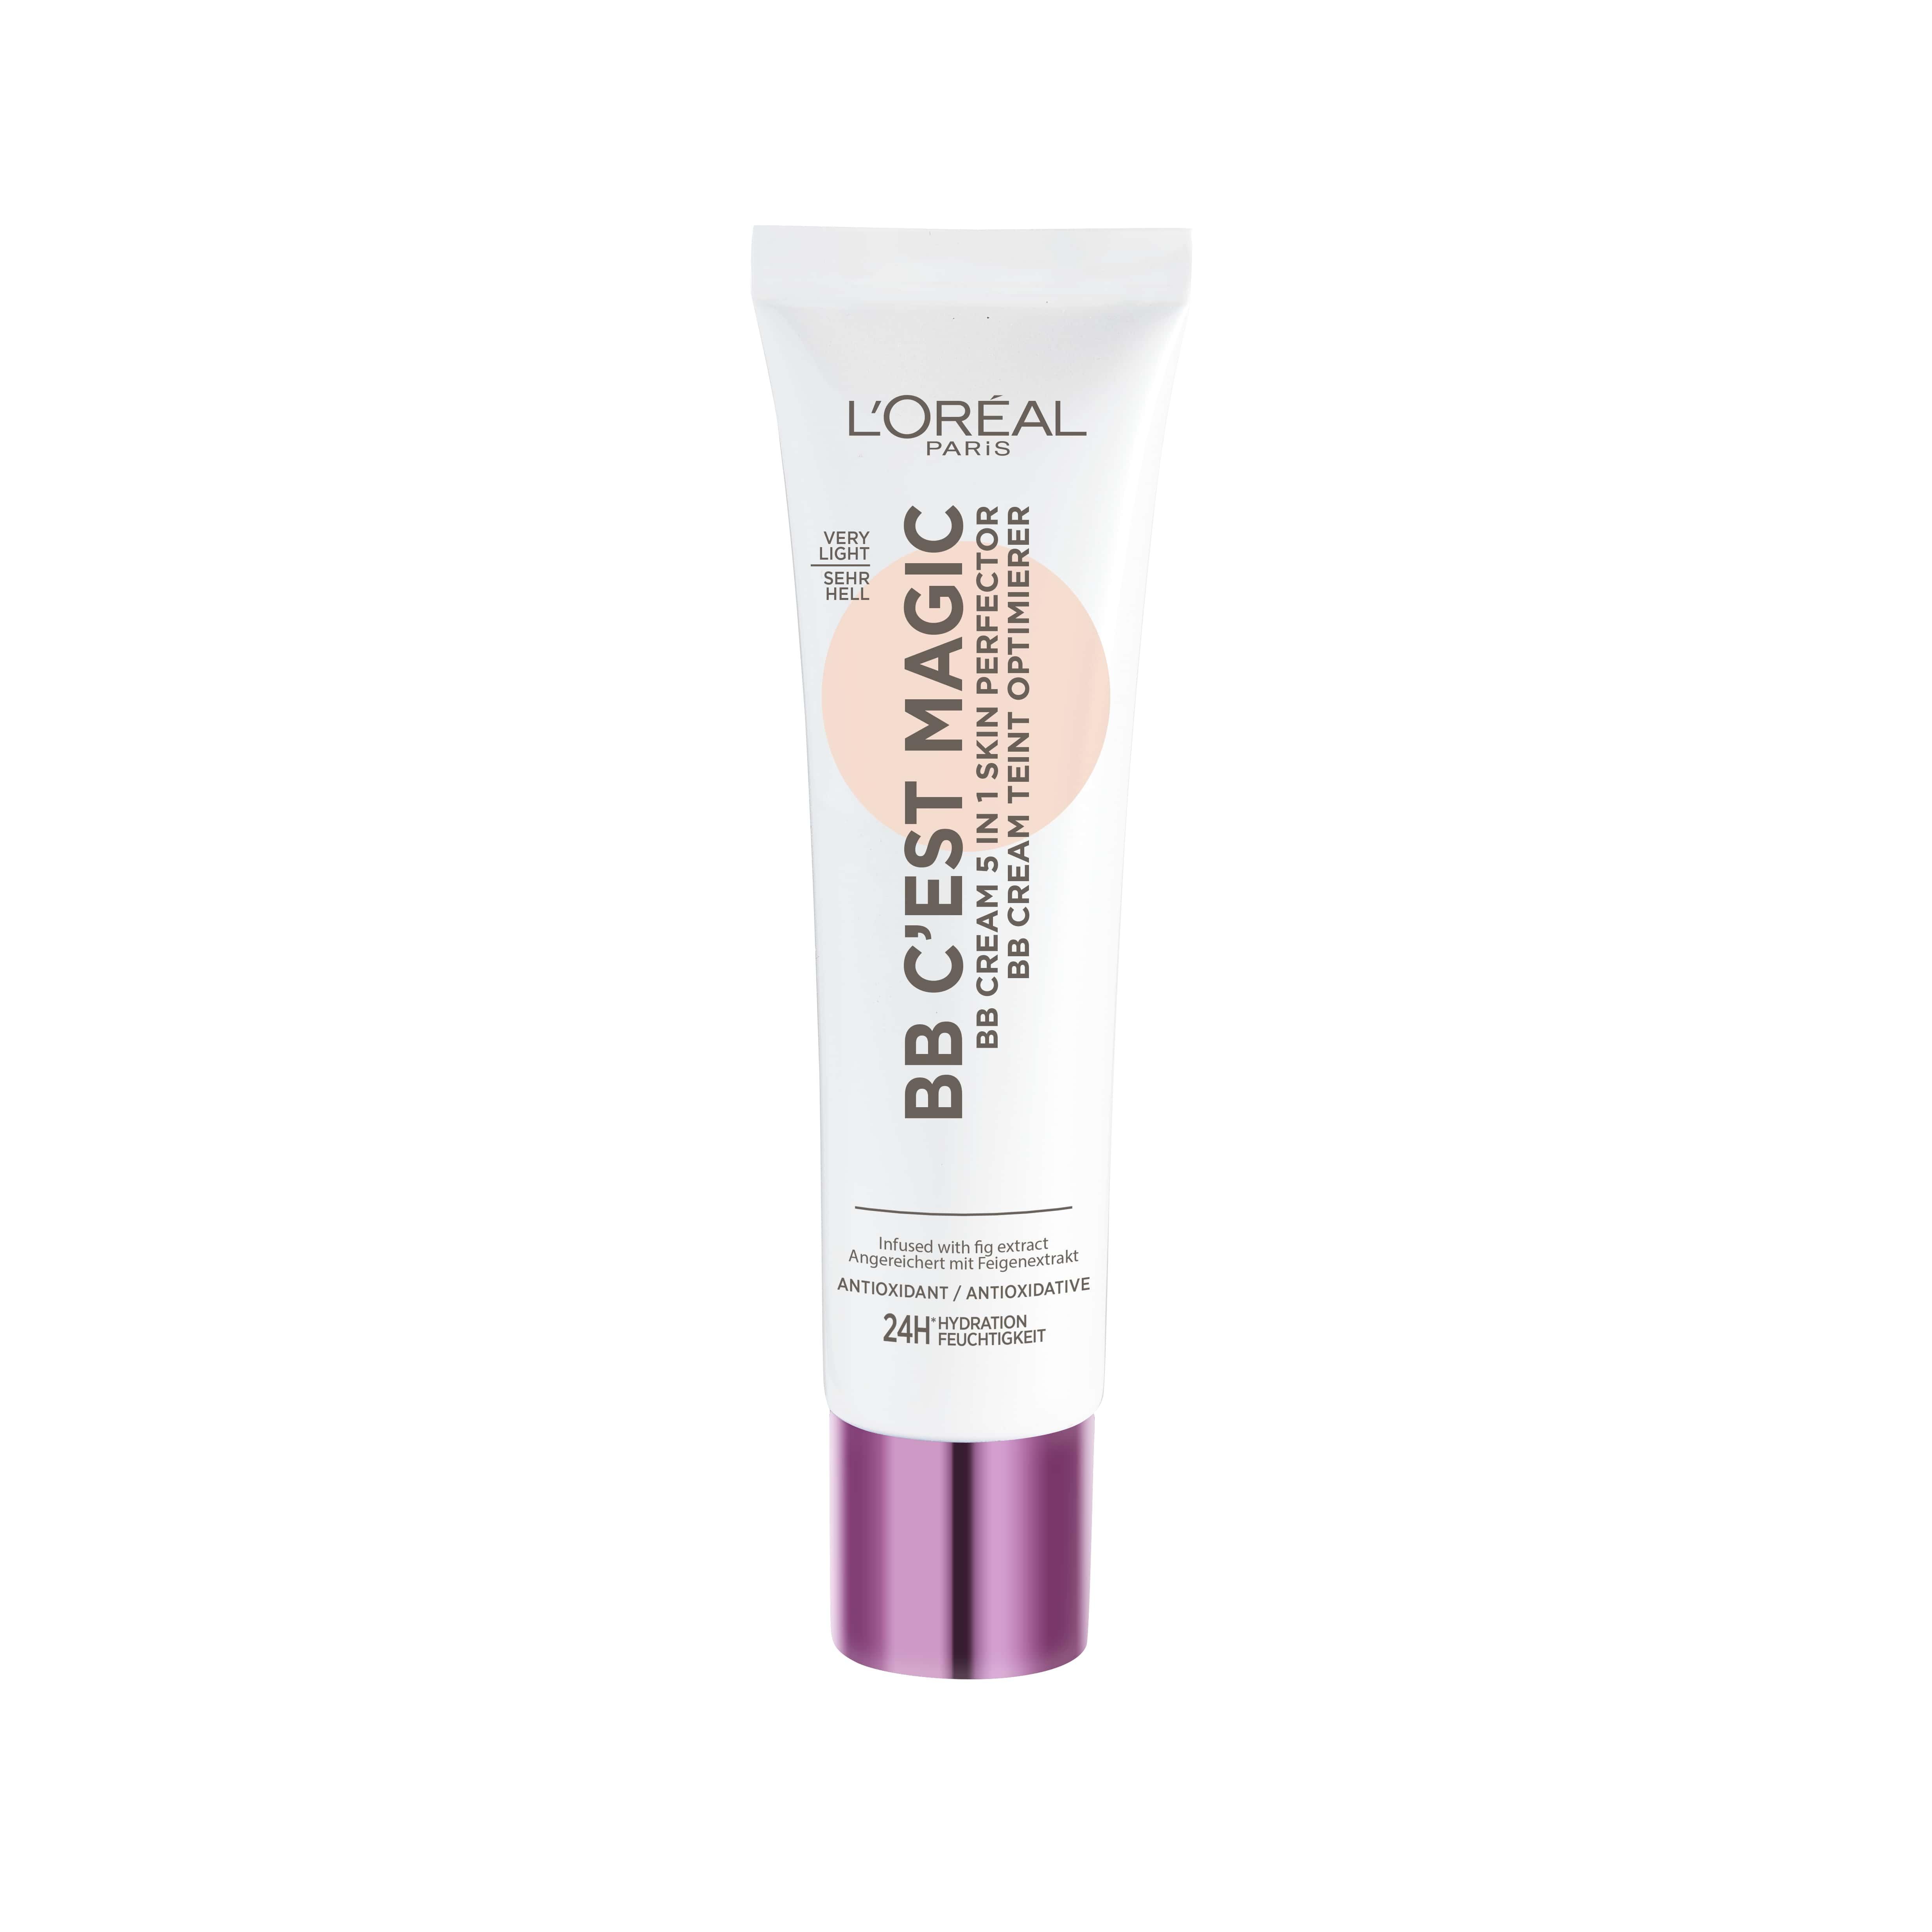 L'Oréal - BB C'est Magic 30 ml - Very Light